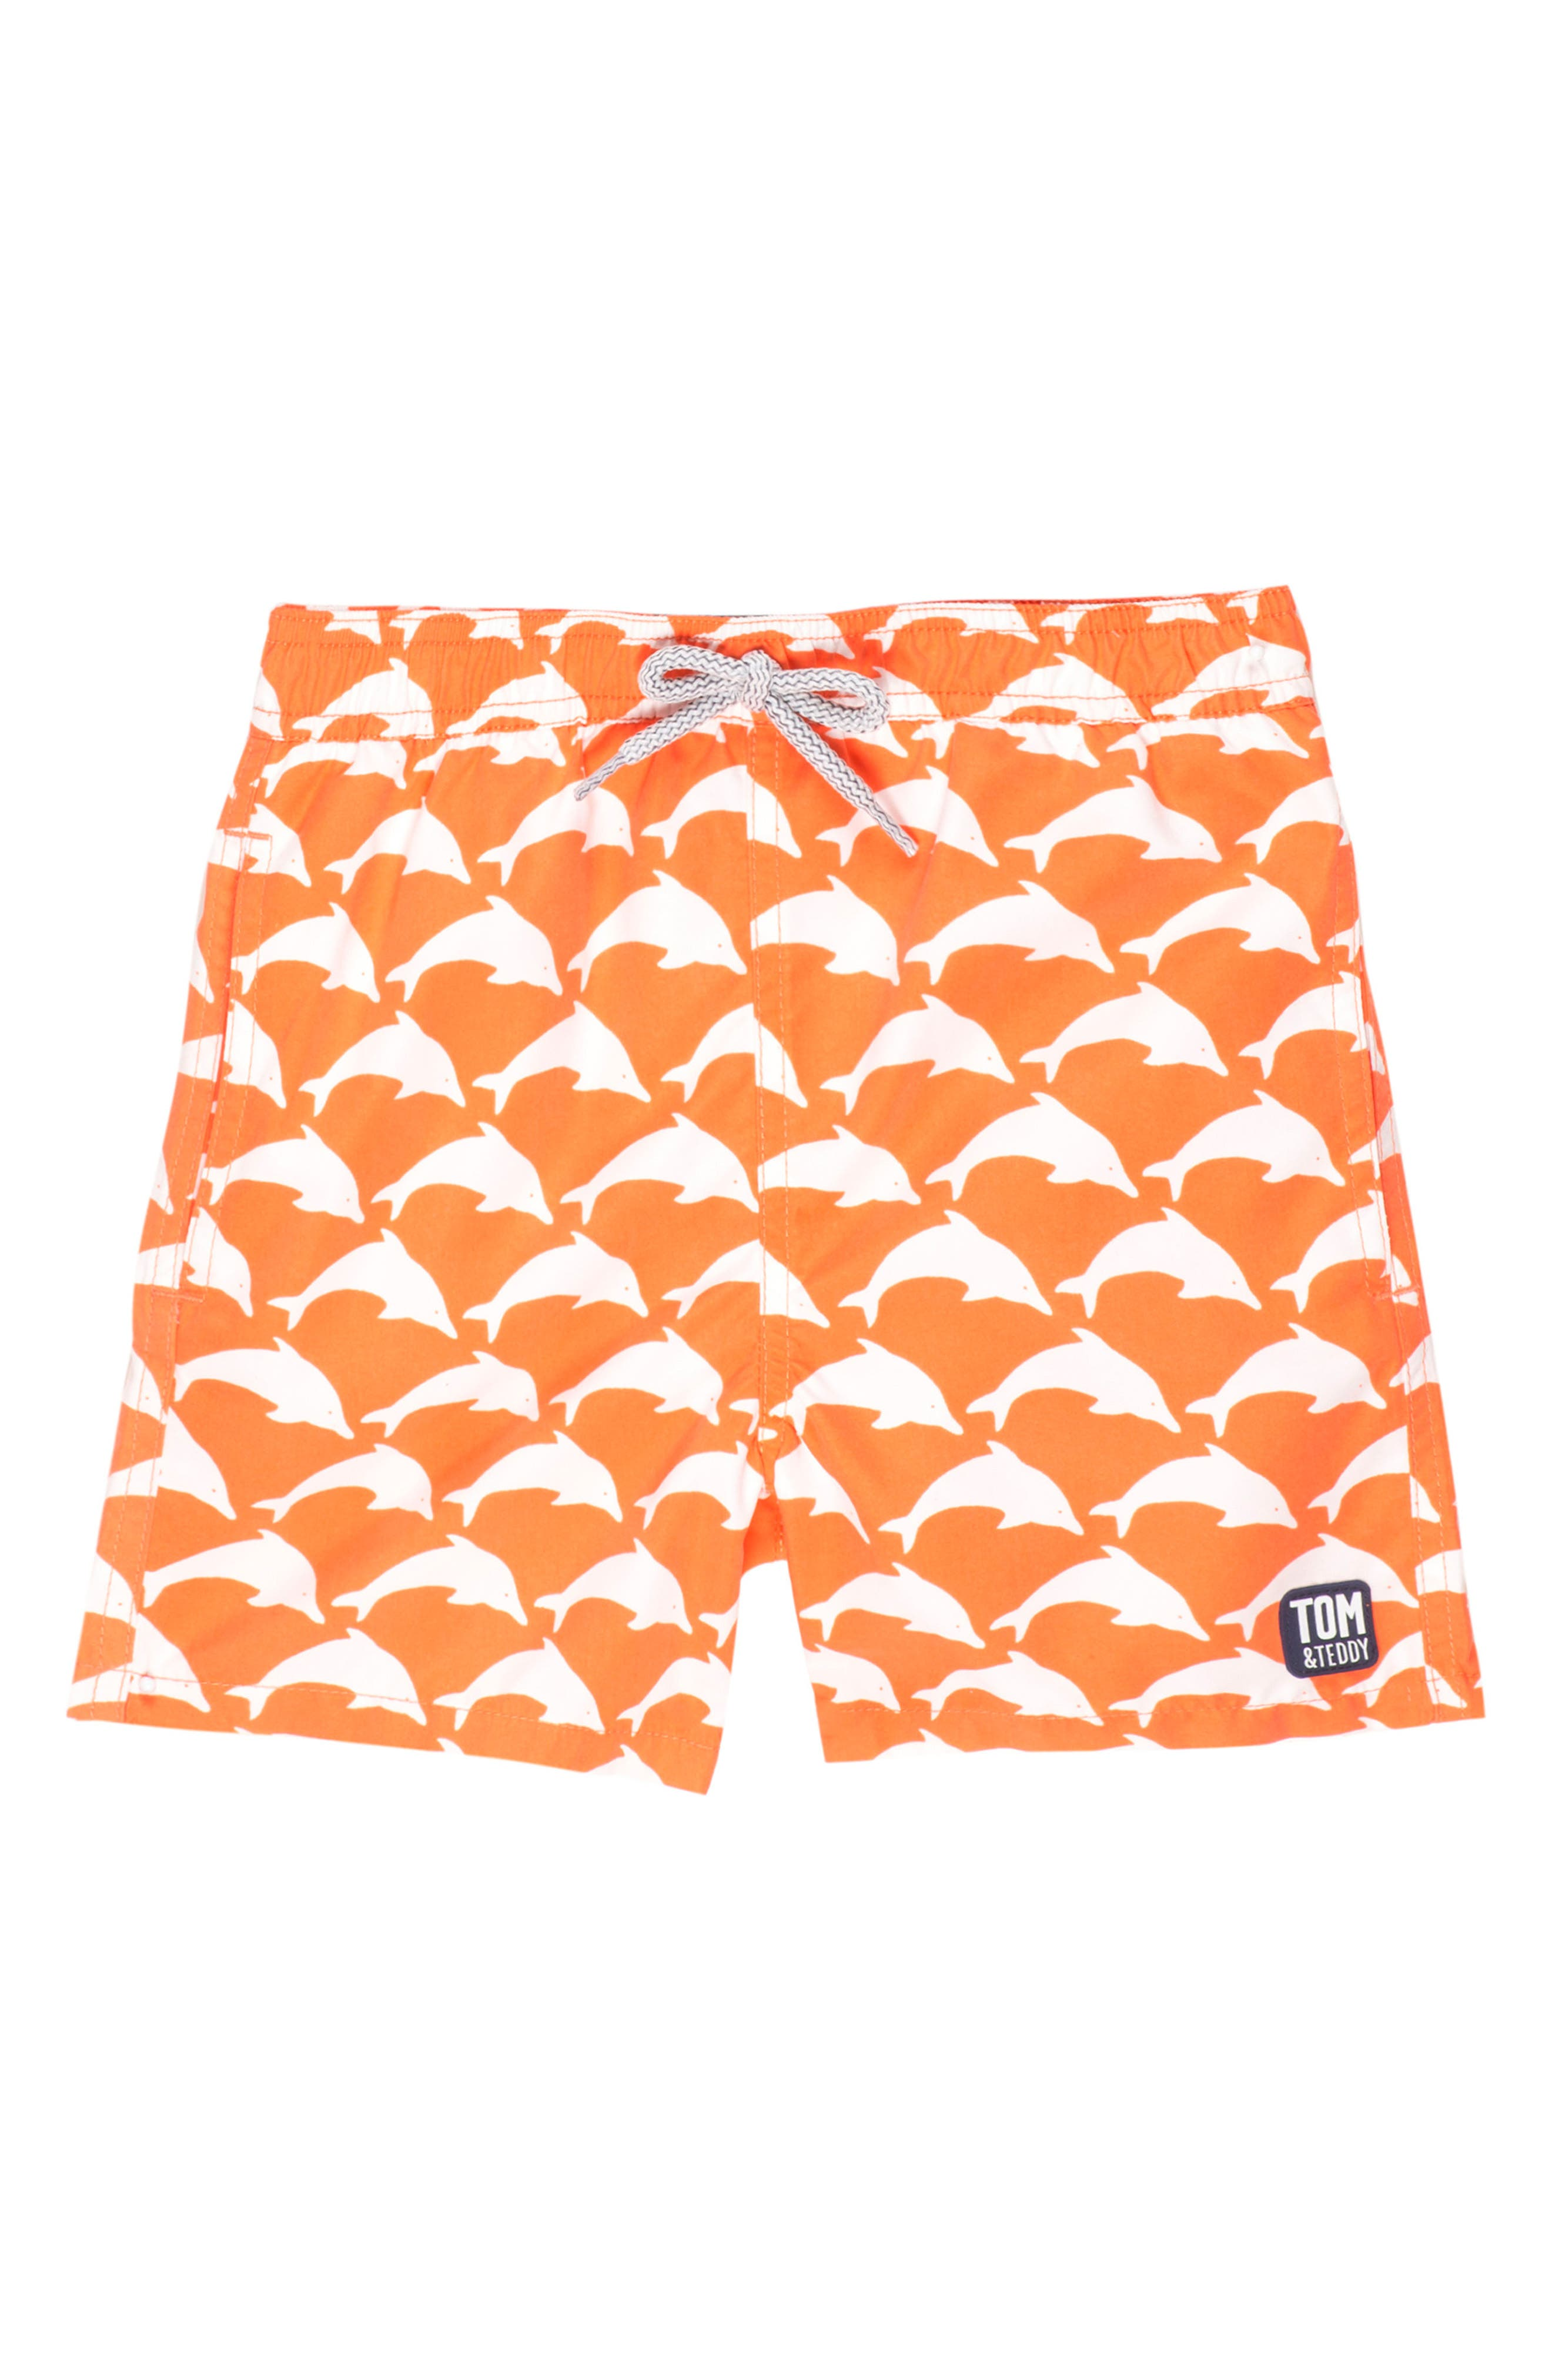 Main Image - Tom & Teddy Dolphin Swim Trunks (Toddler Boys, Little Boys & Big Boys)